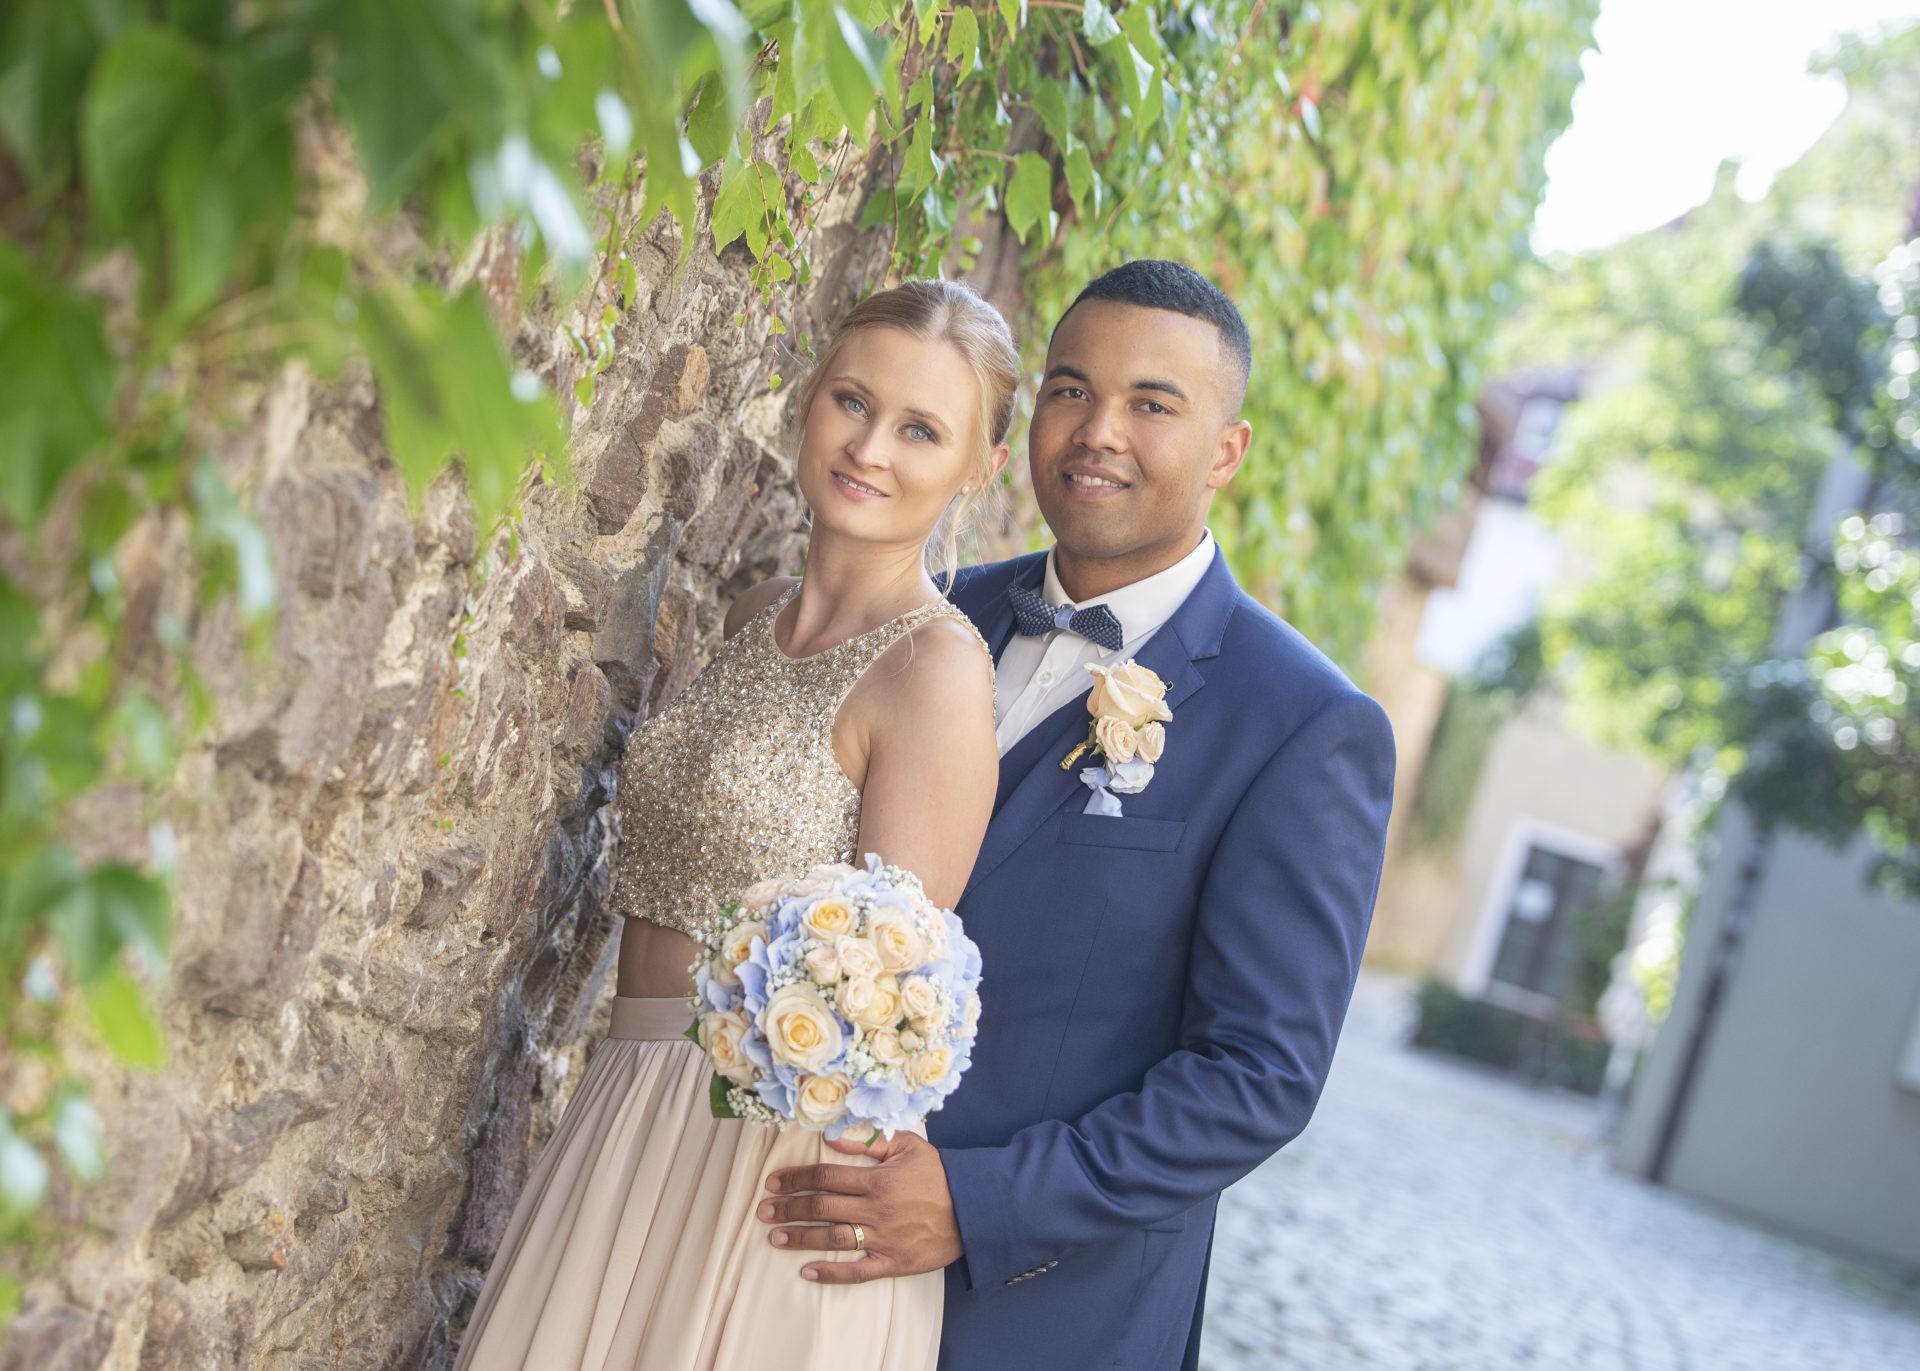 Hochzeitsfotografie Skyline Photography